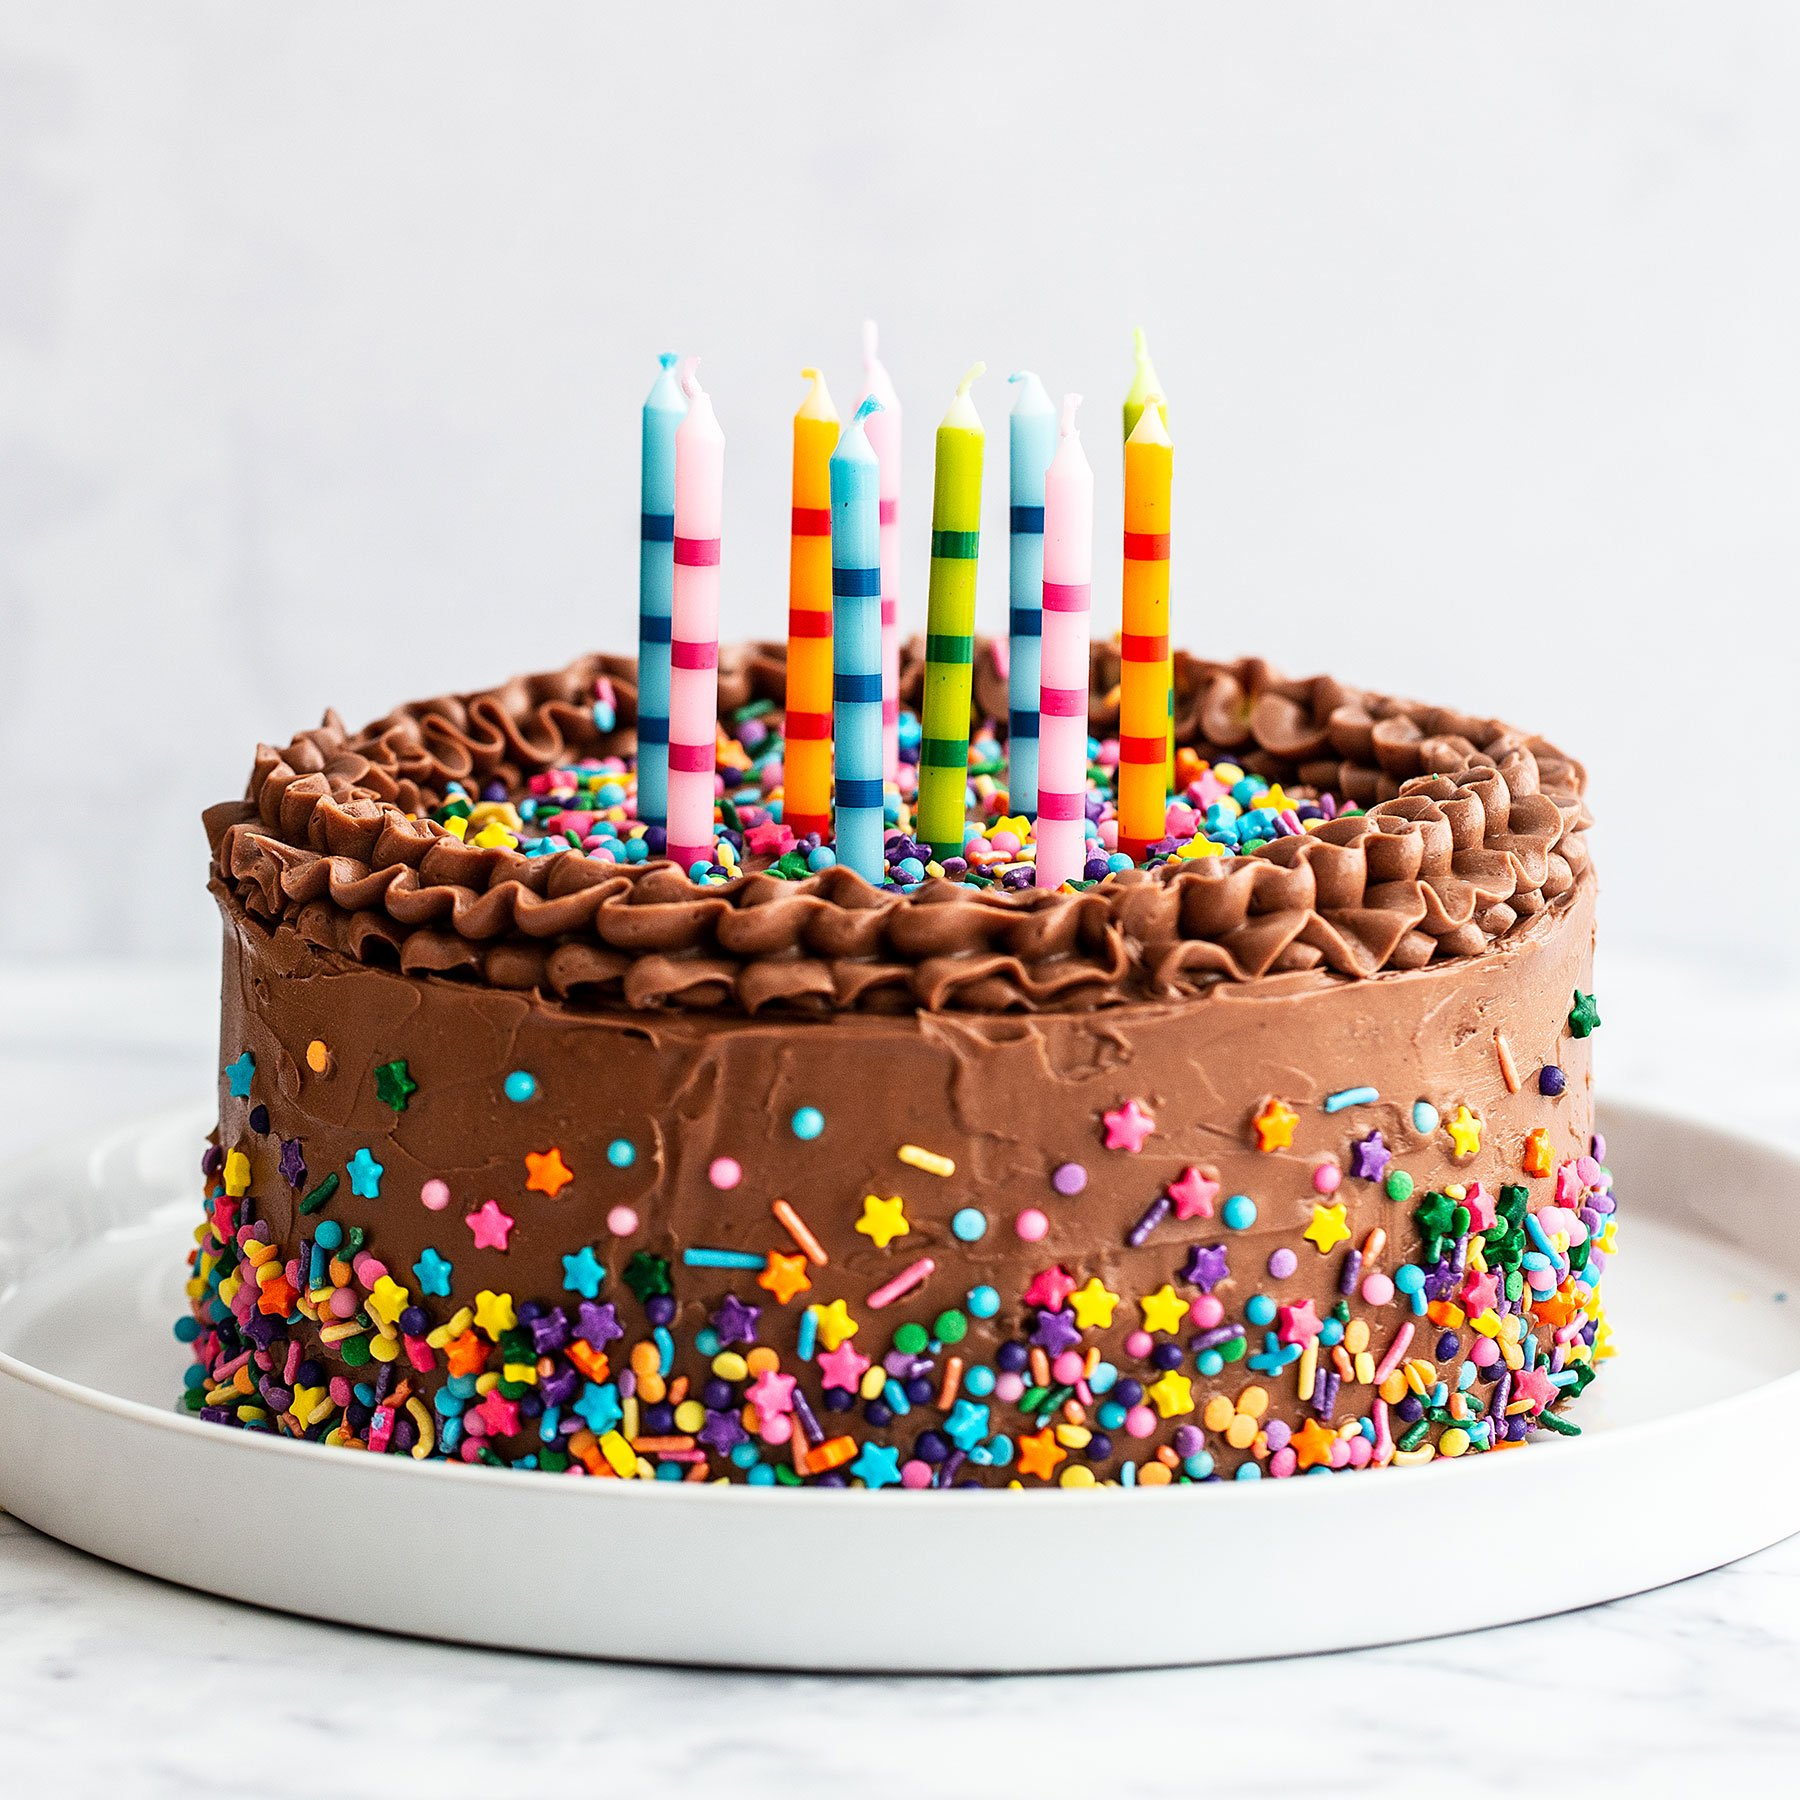 Chocolate Birthday Cake With Colorful Stars